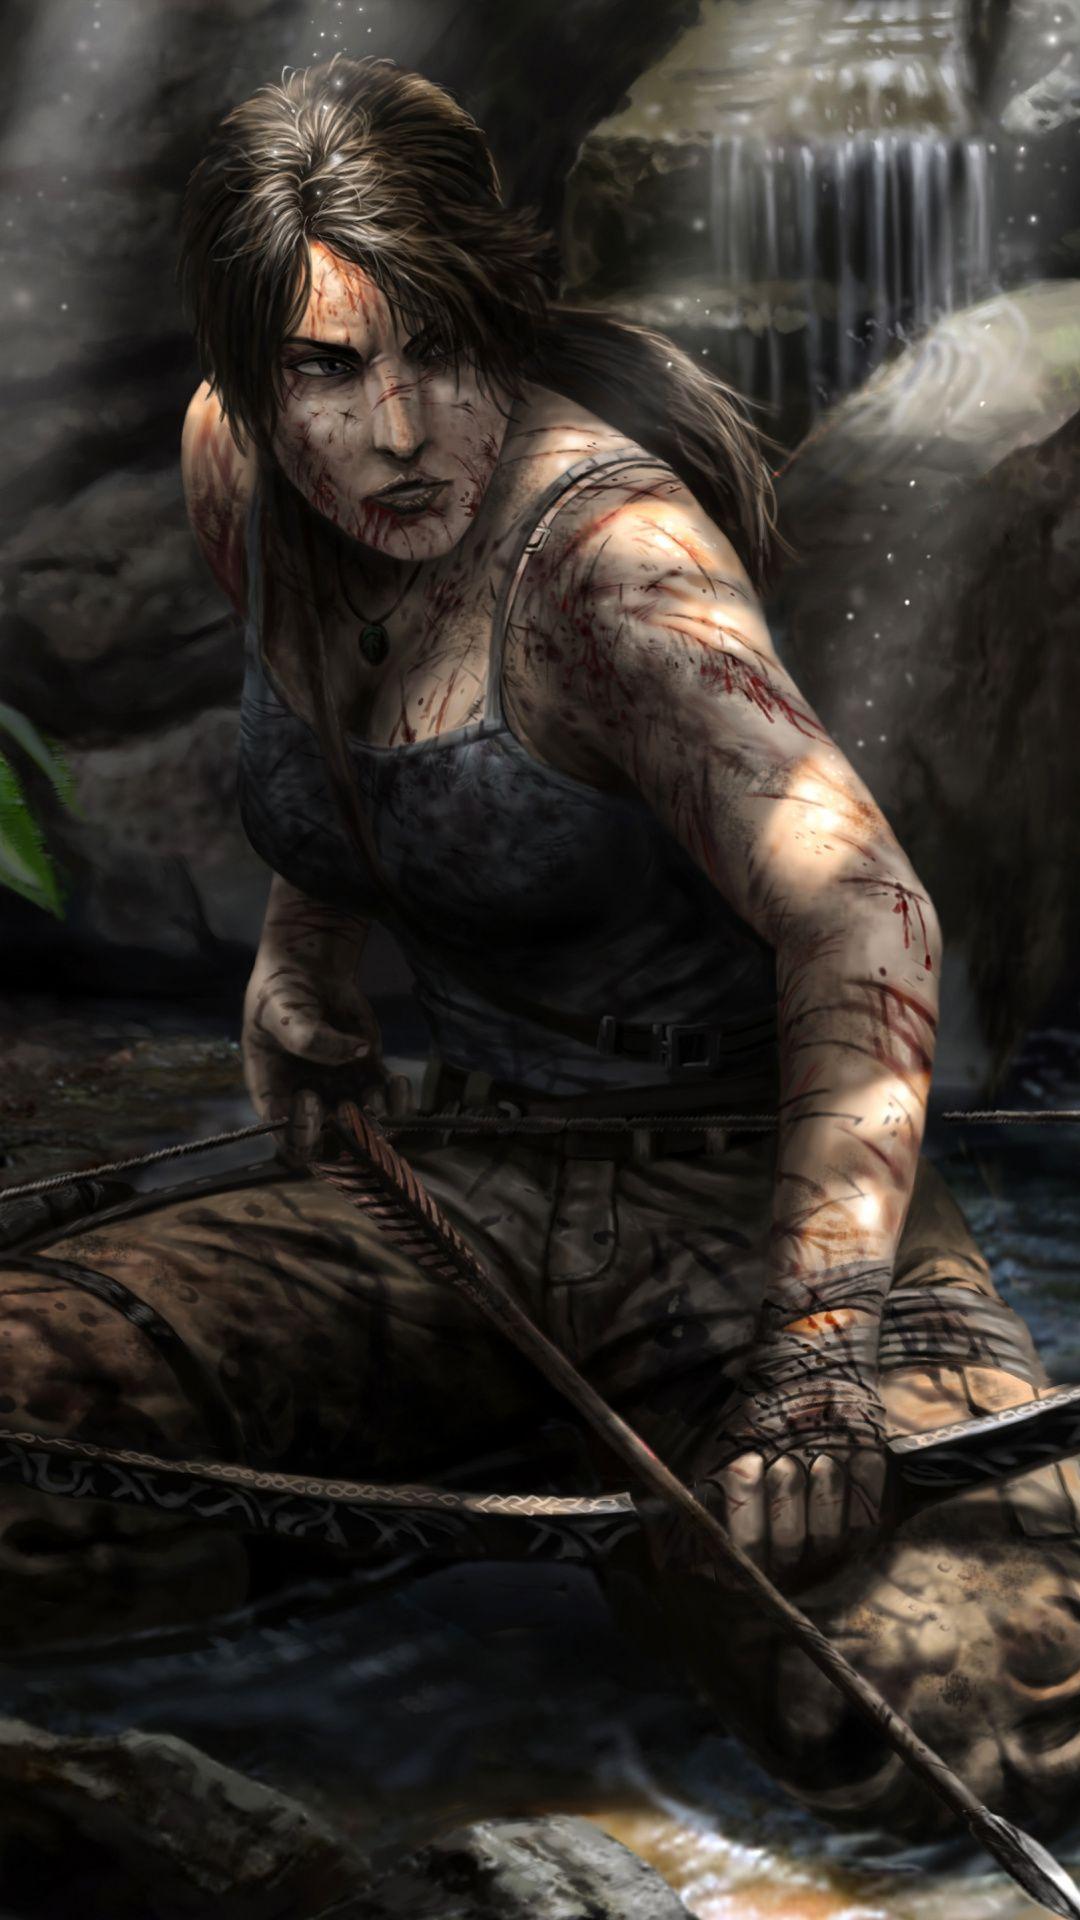 Archer Lara Croft Video Game Artwork Wallpaper Lara Croft Tomb Raider Tomb Raider Lara Croft